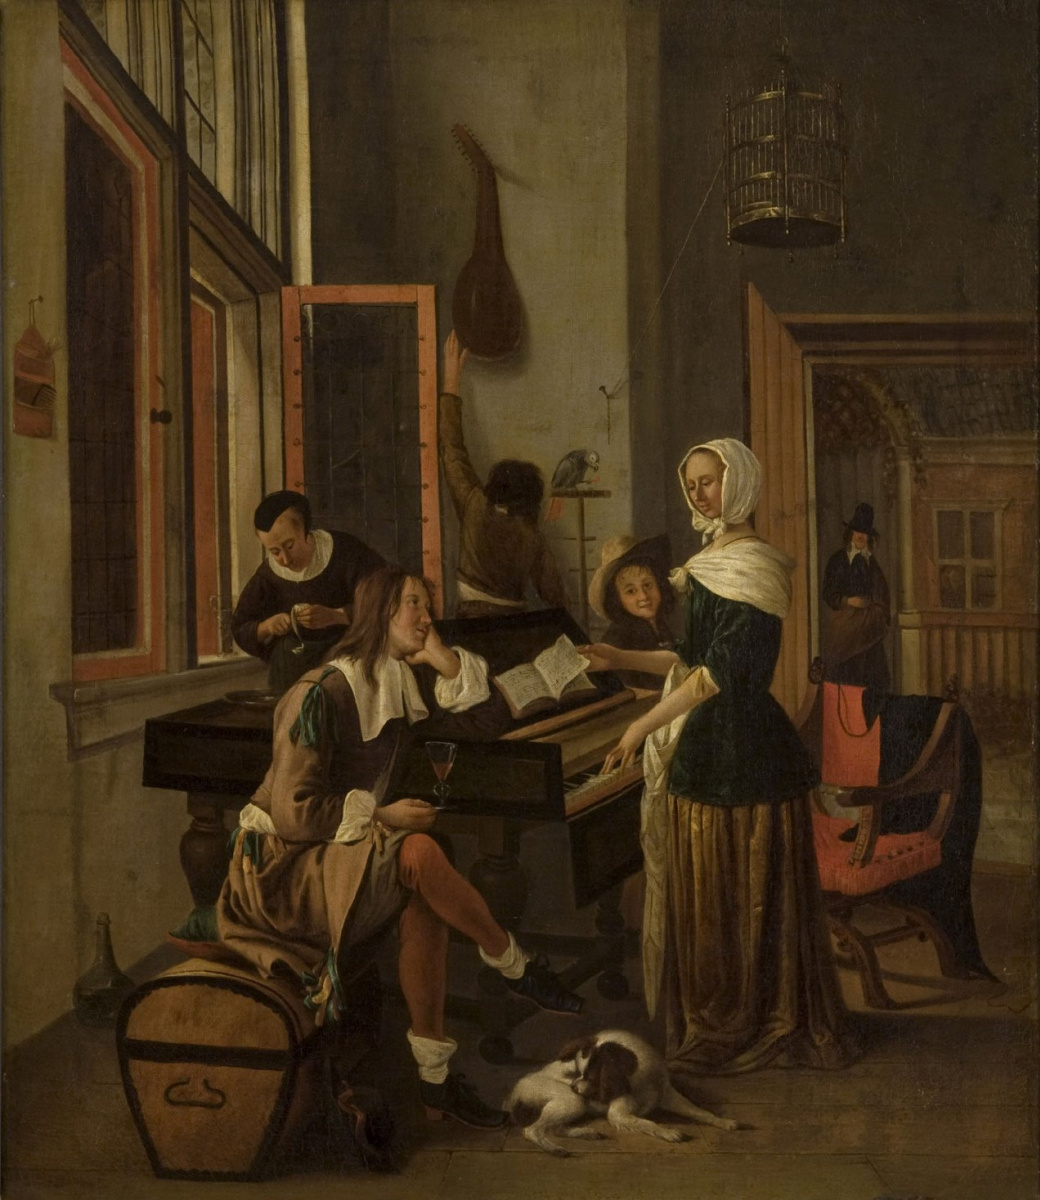 Jan Steen. The woman behind clavichord